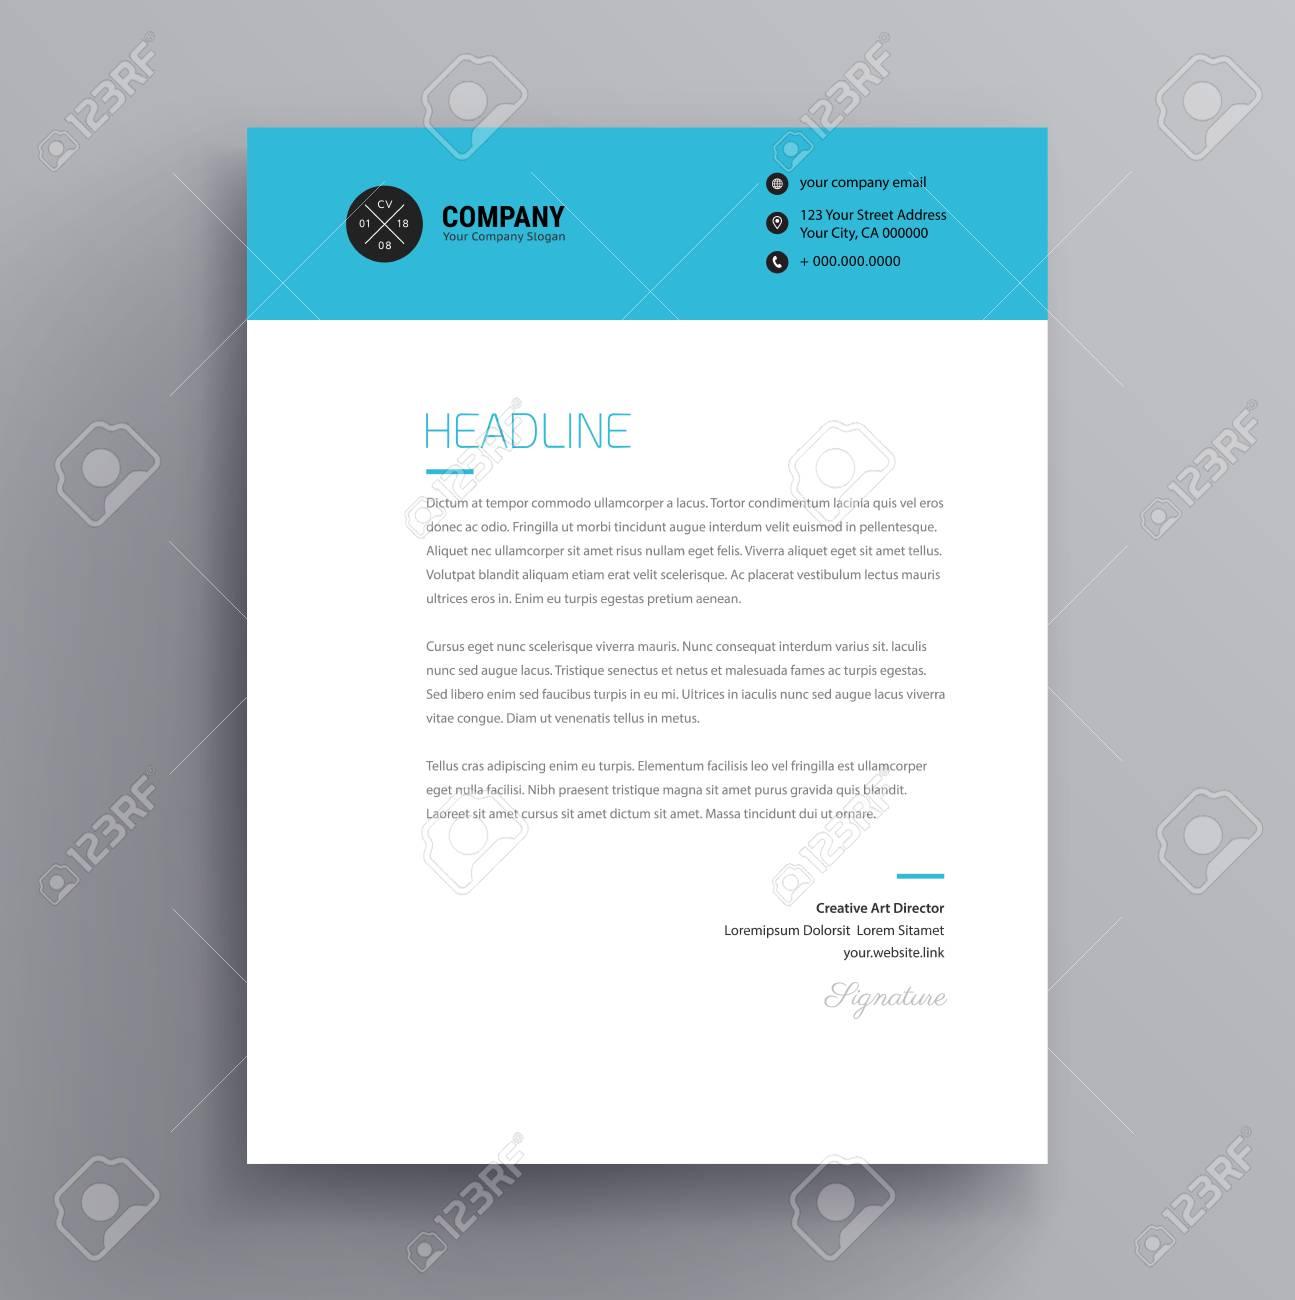 elegant letterhead cover letter template design in minimalist style blue color header vector